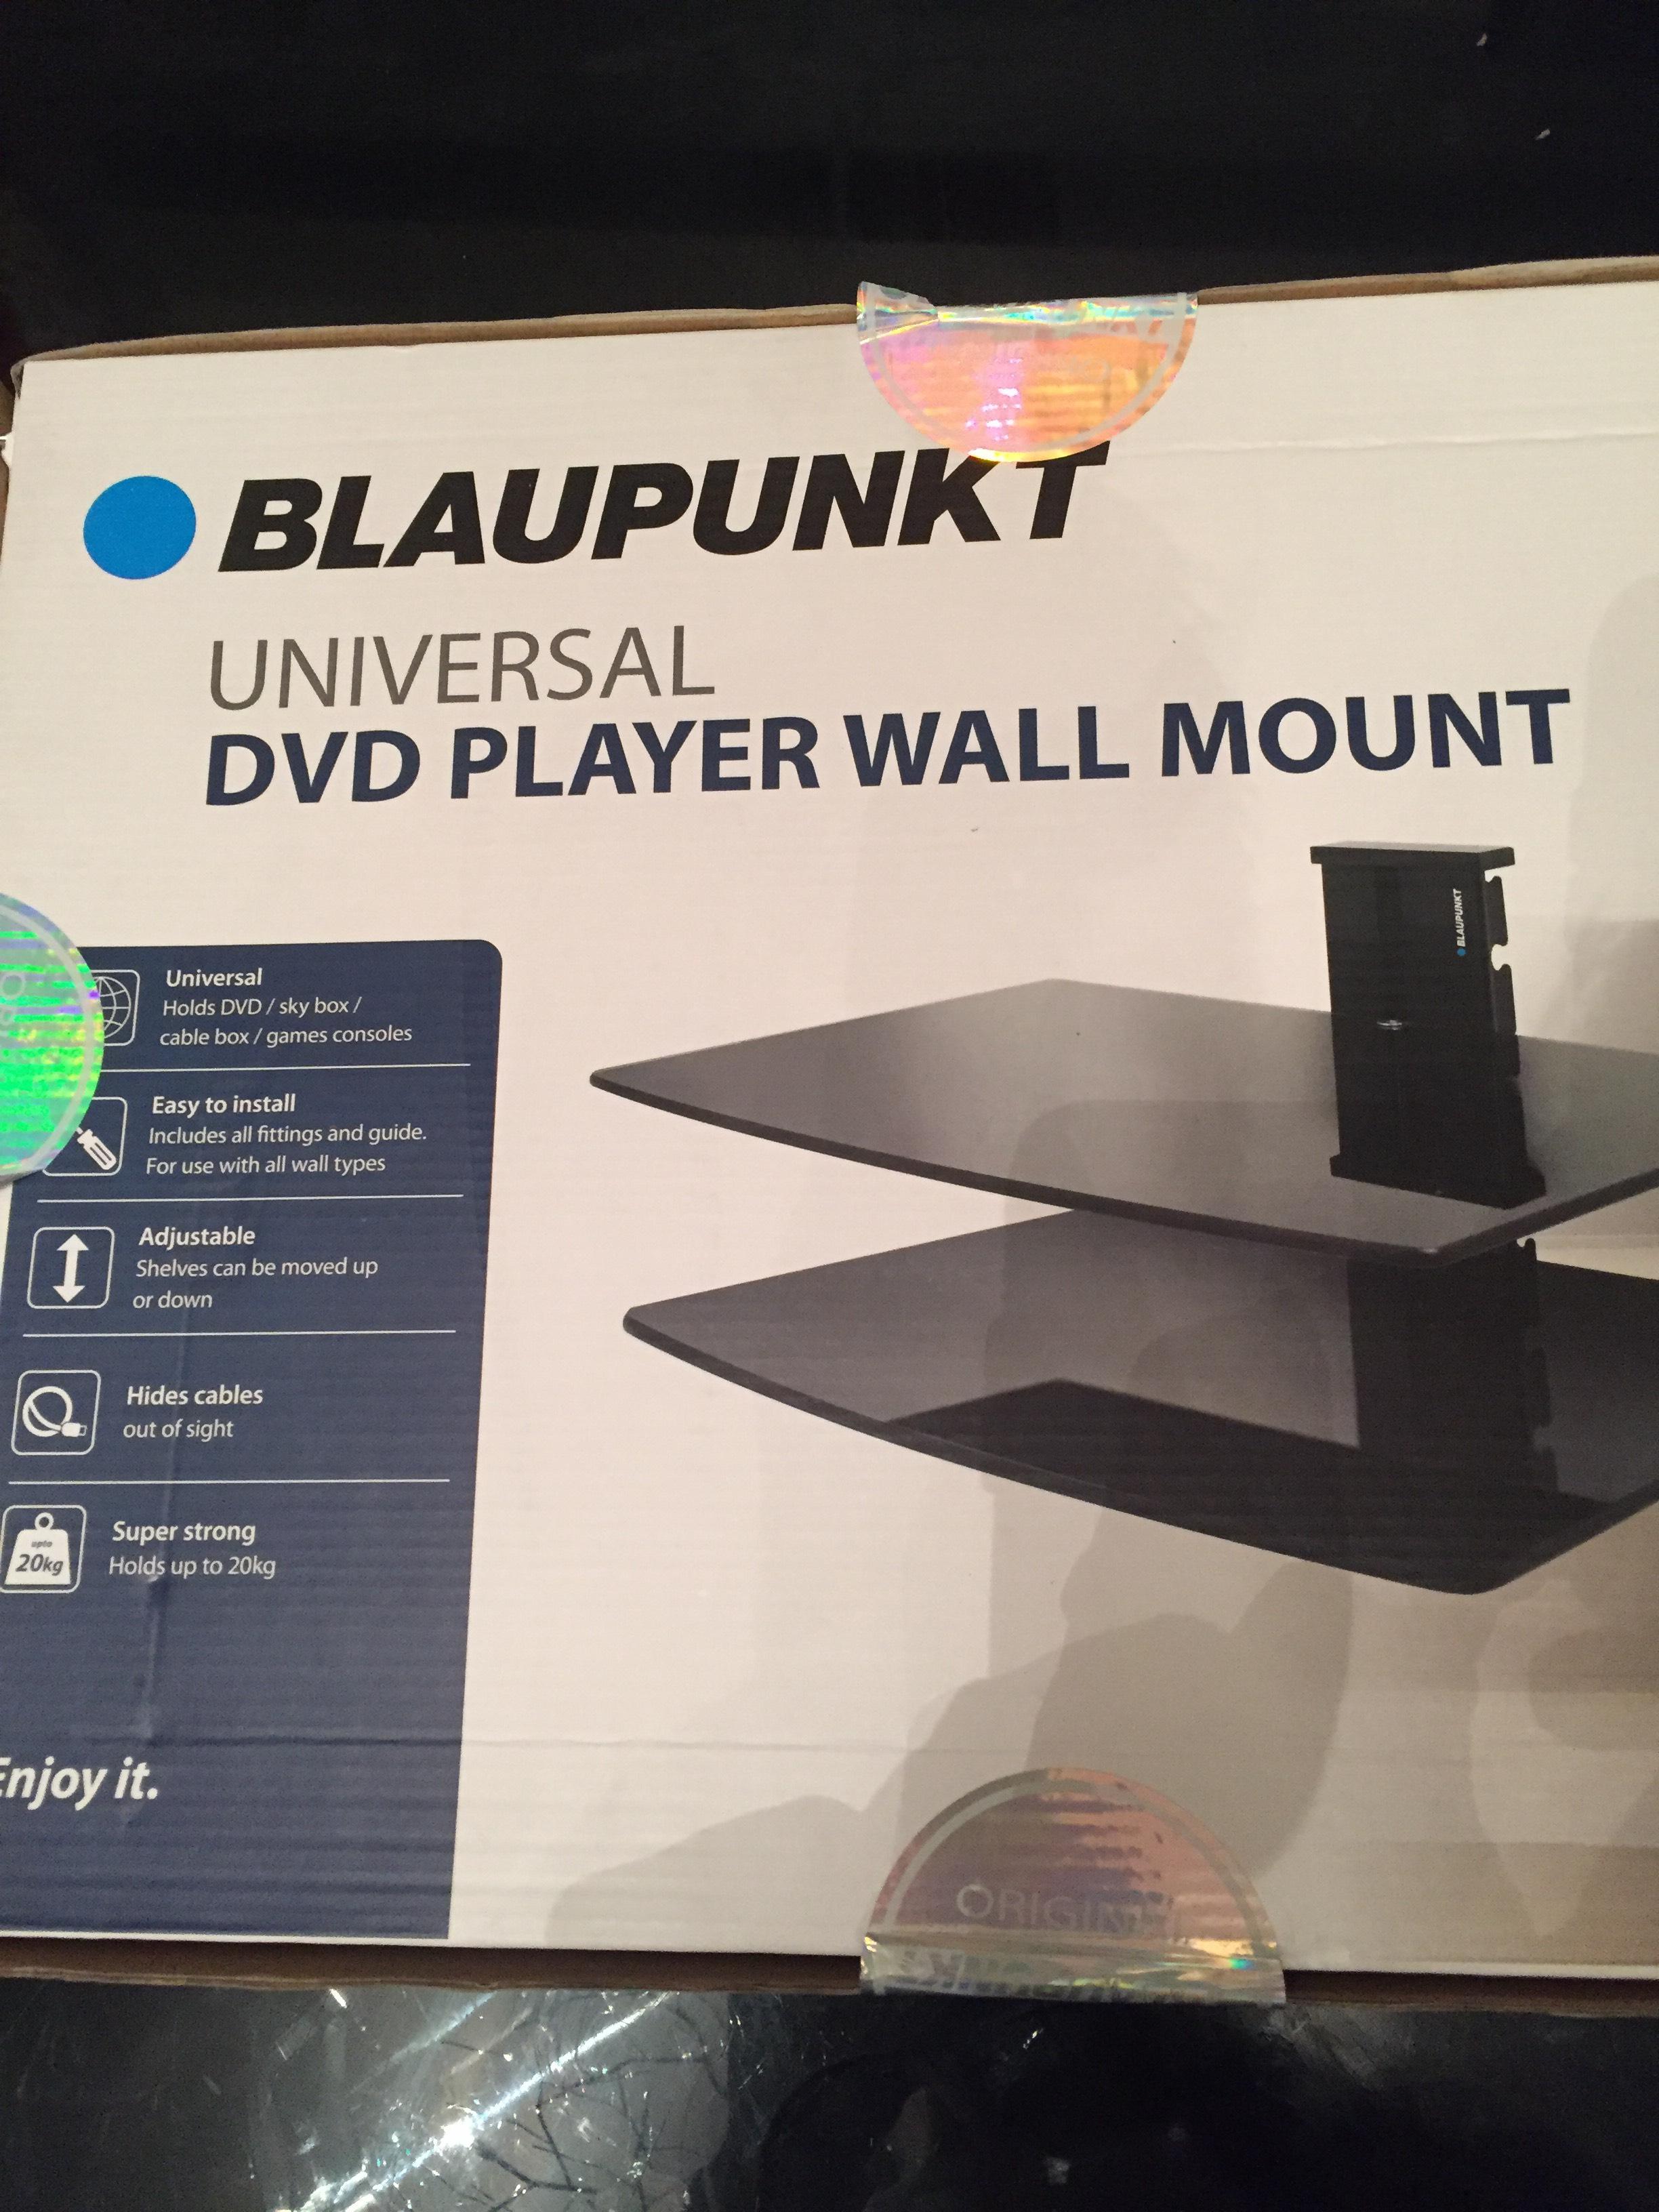 Blaupunkt DVD/Sky/Games Consoles Wall Mount Double Glass Shelves - £1 Instore at B&M